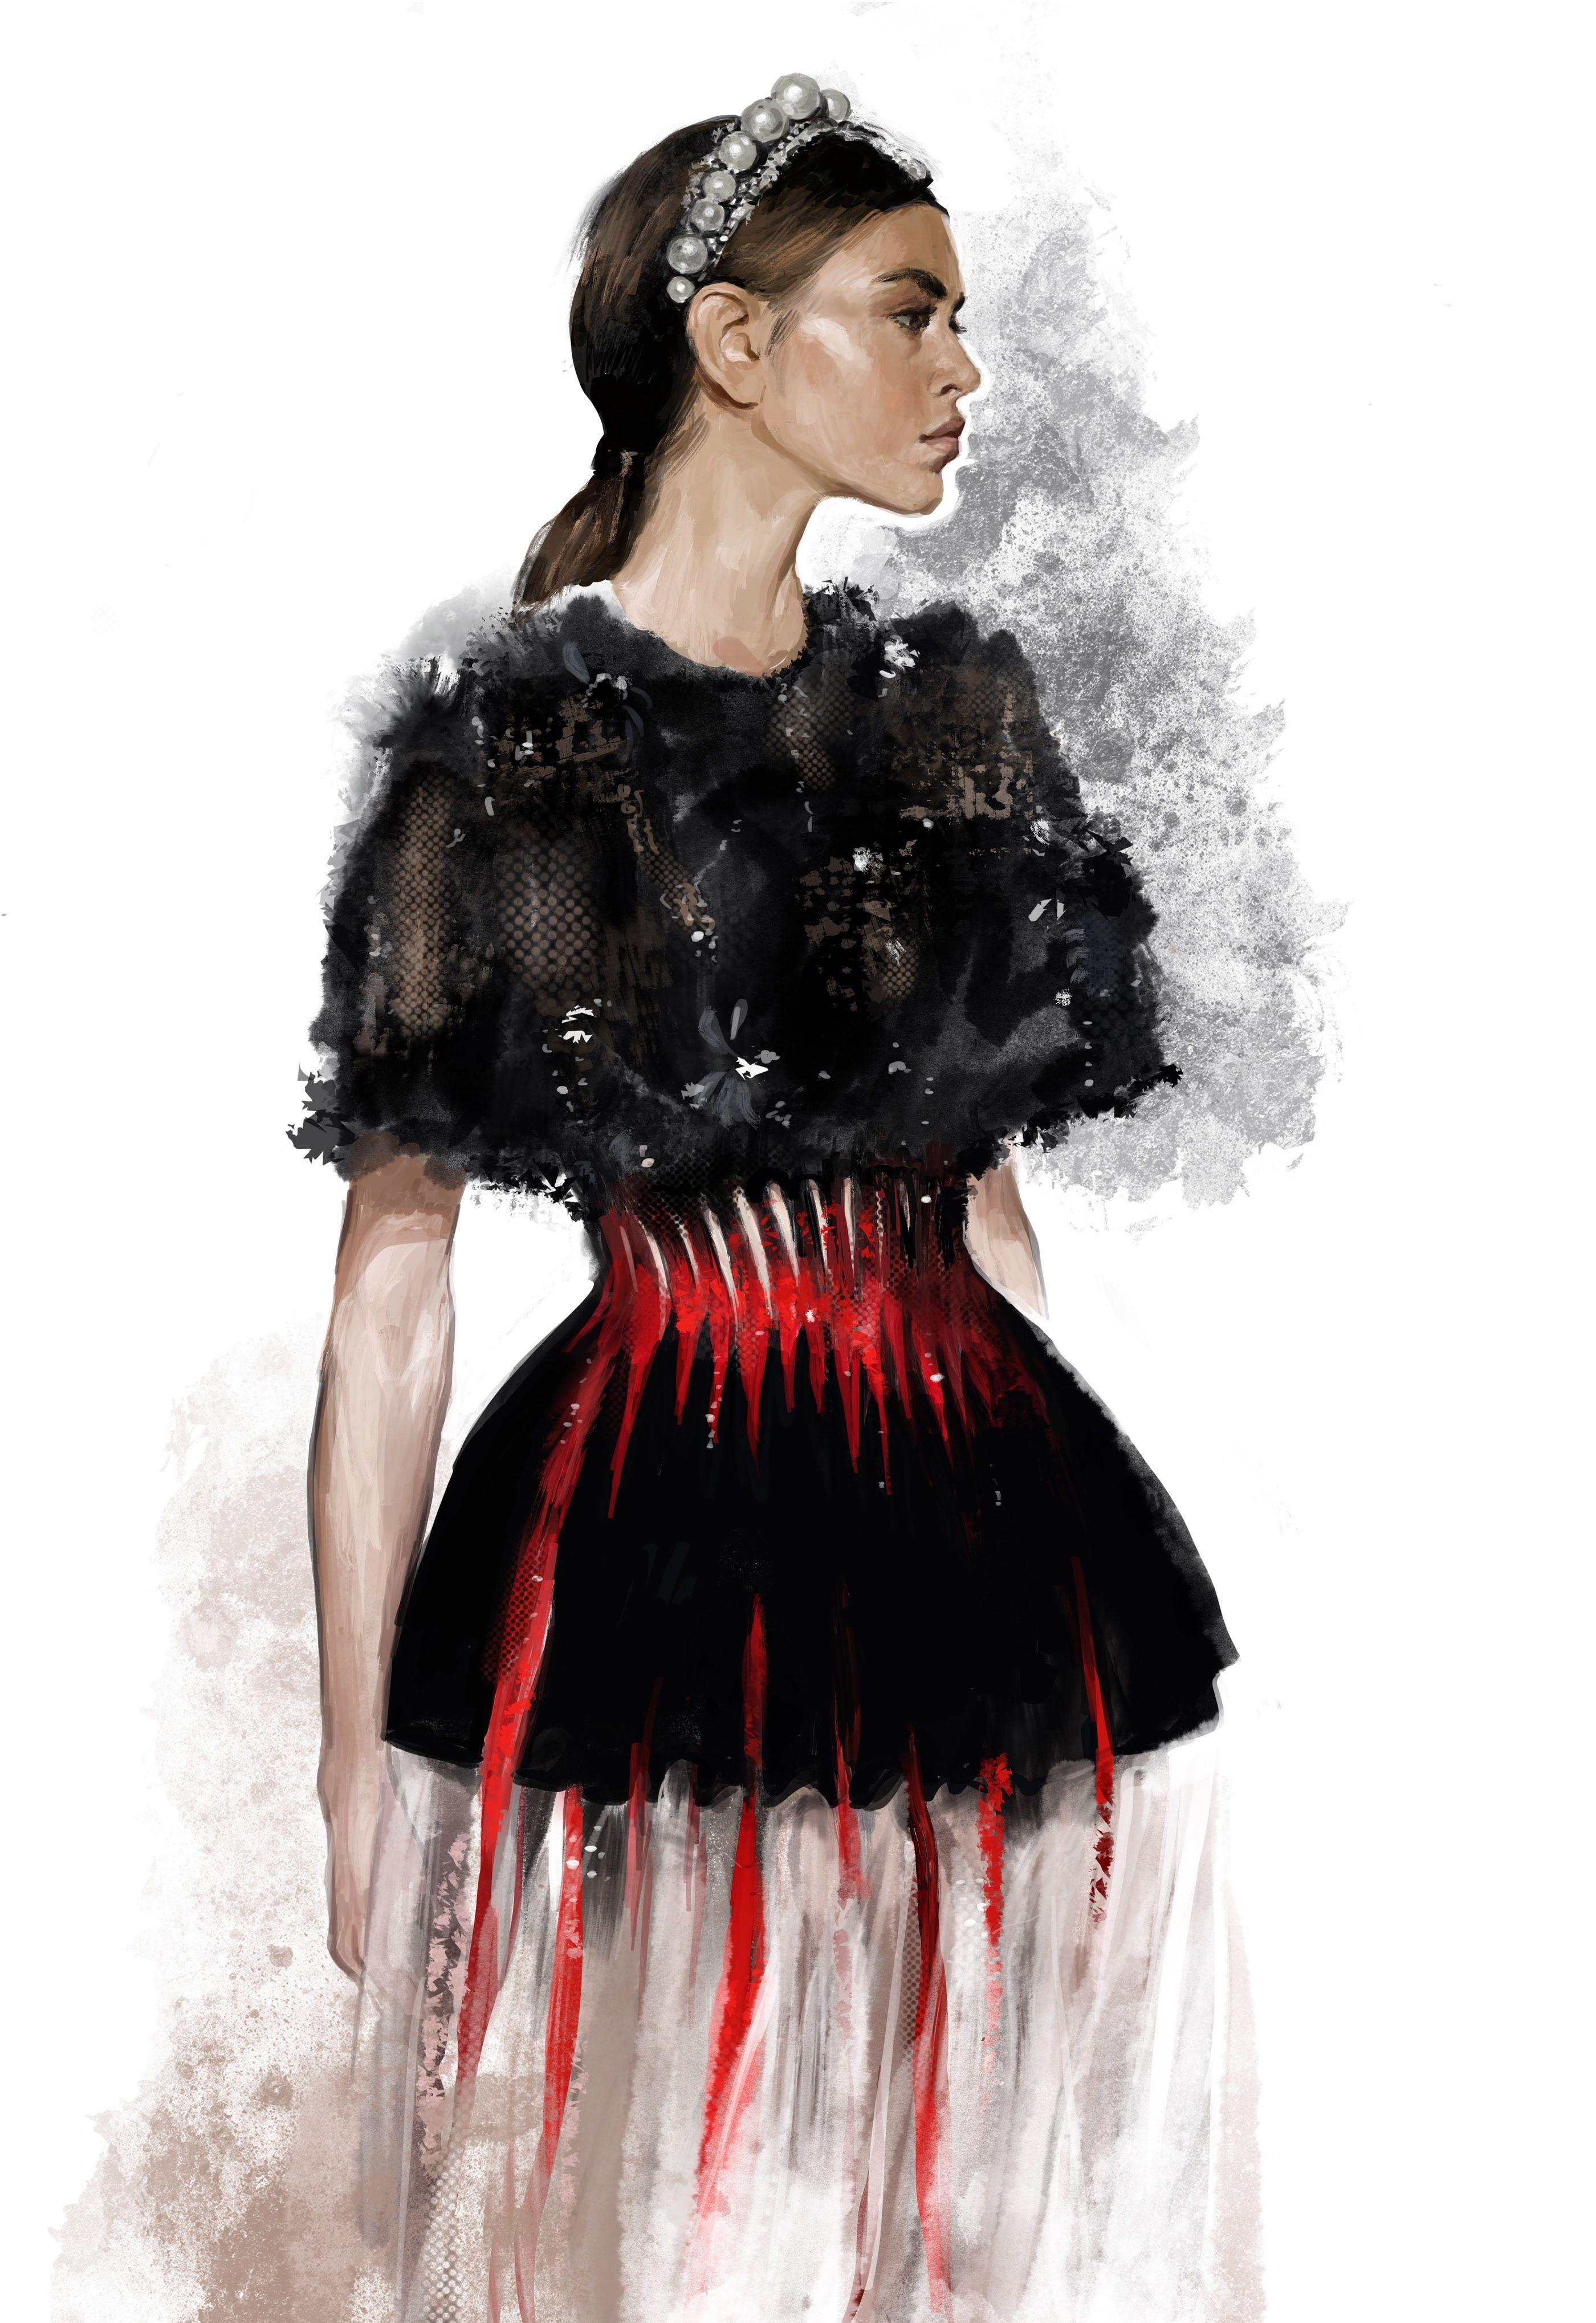 Digital Fashion Illustration On Behance In 2020 Fashion Illustration Dresses Digital Fashion Illustration Fashion Illustration